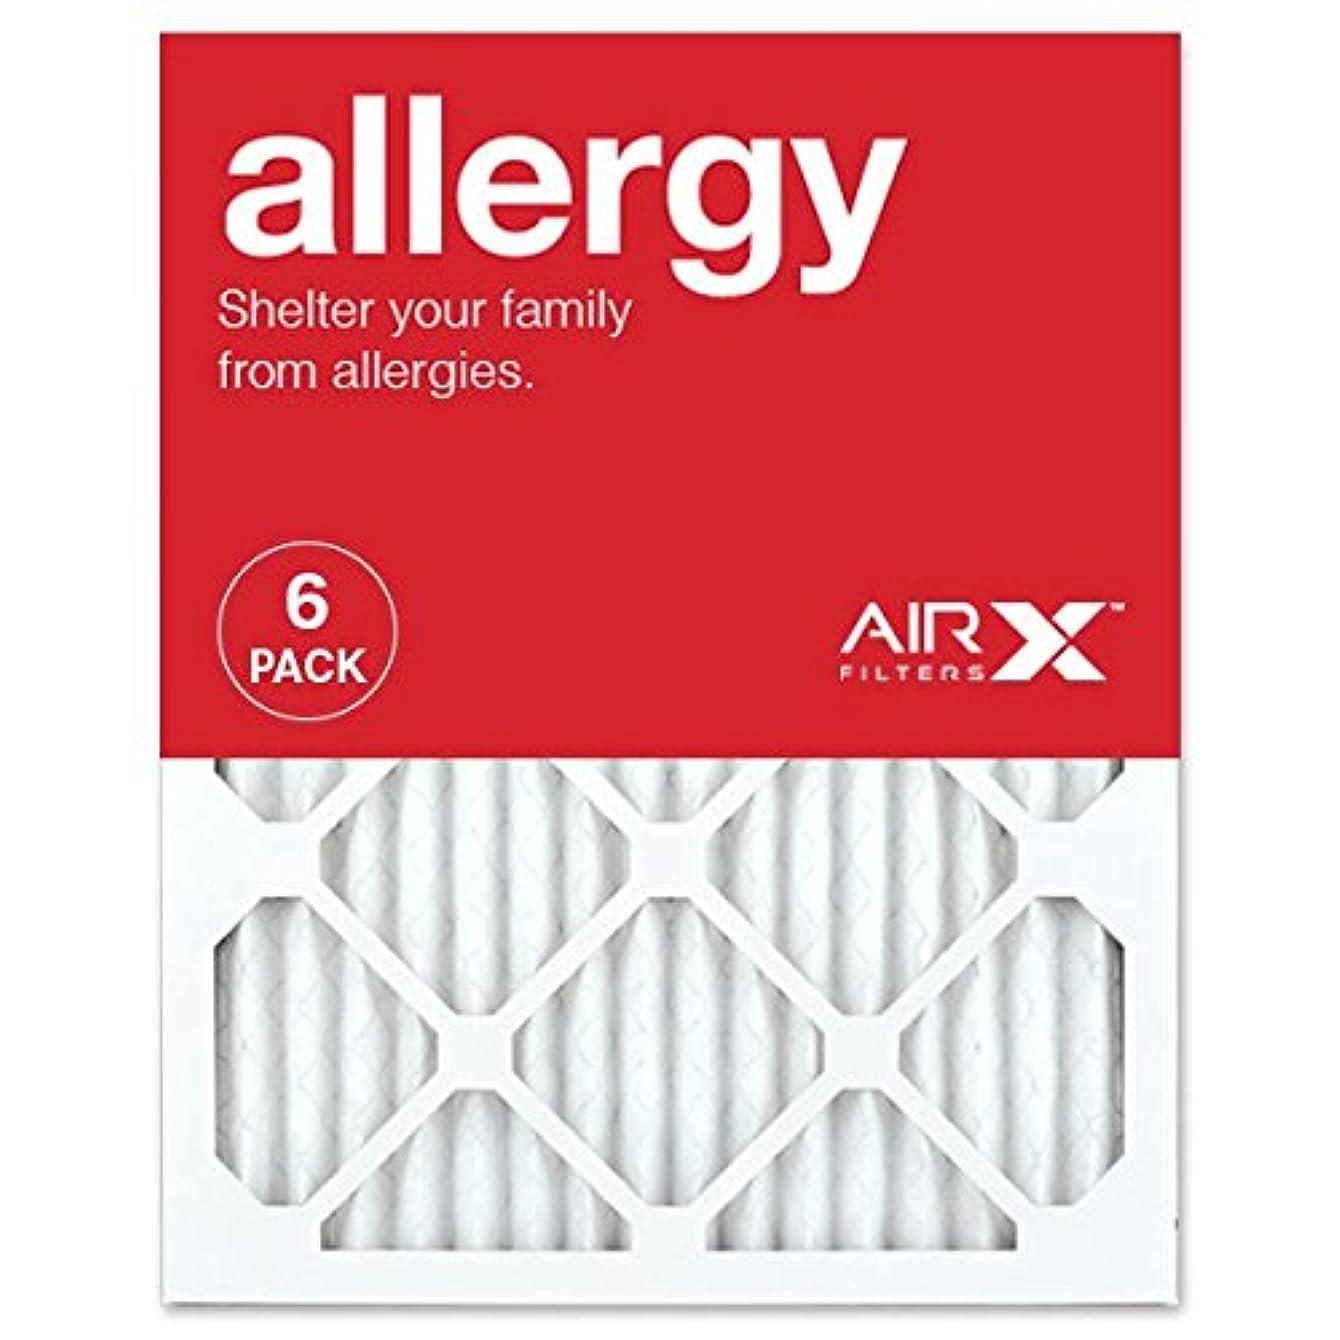 AIRx ALLERGY 16x20x1 MERV 11 Pleated Air Filter - Made in the USA - Box of 6 jqhtwxolibcyp47